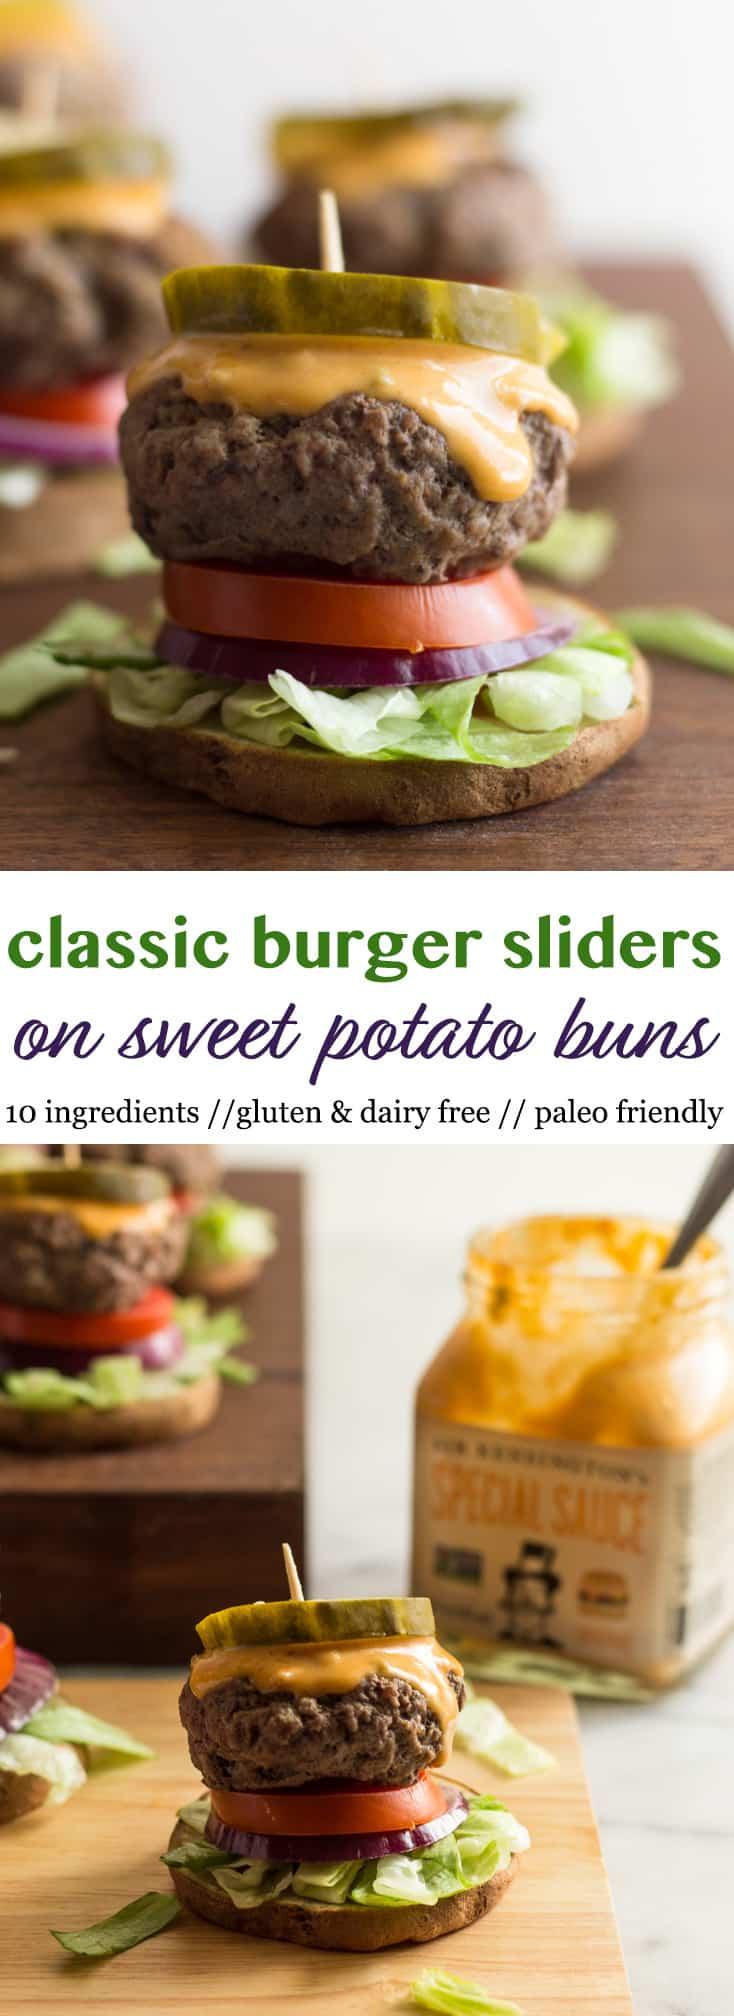 Classic Burger Sliders on Sweet Potato Buns Pinterest Image